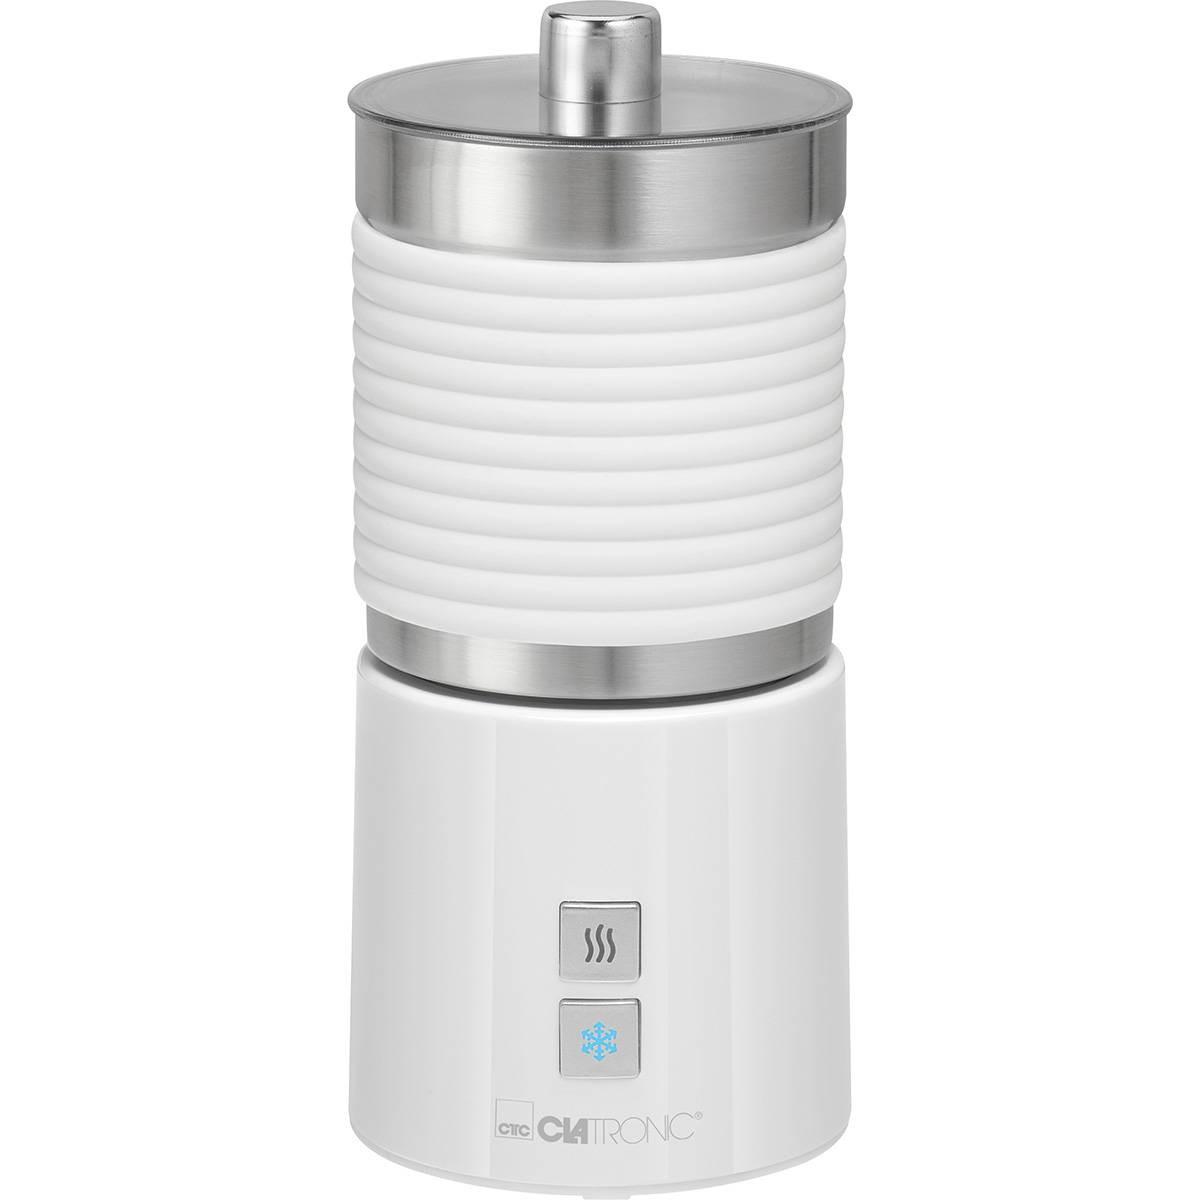 Clatronic Espumador de leche MS 3654 blanco